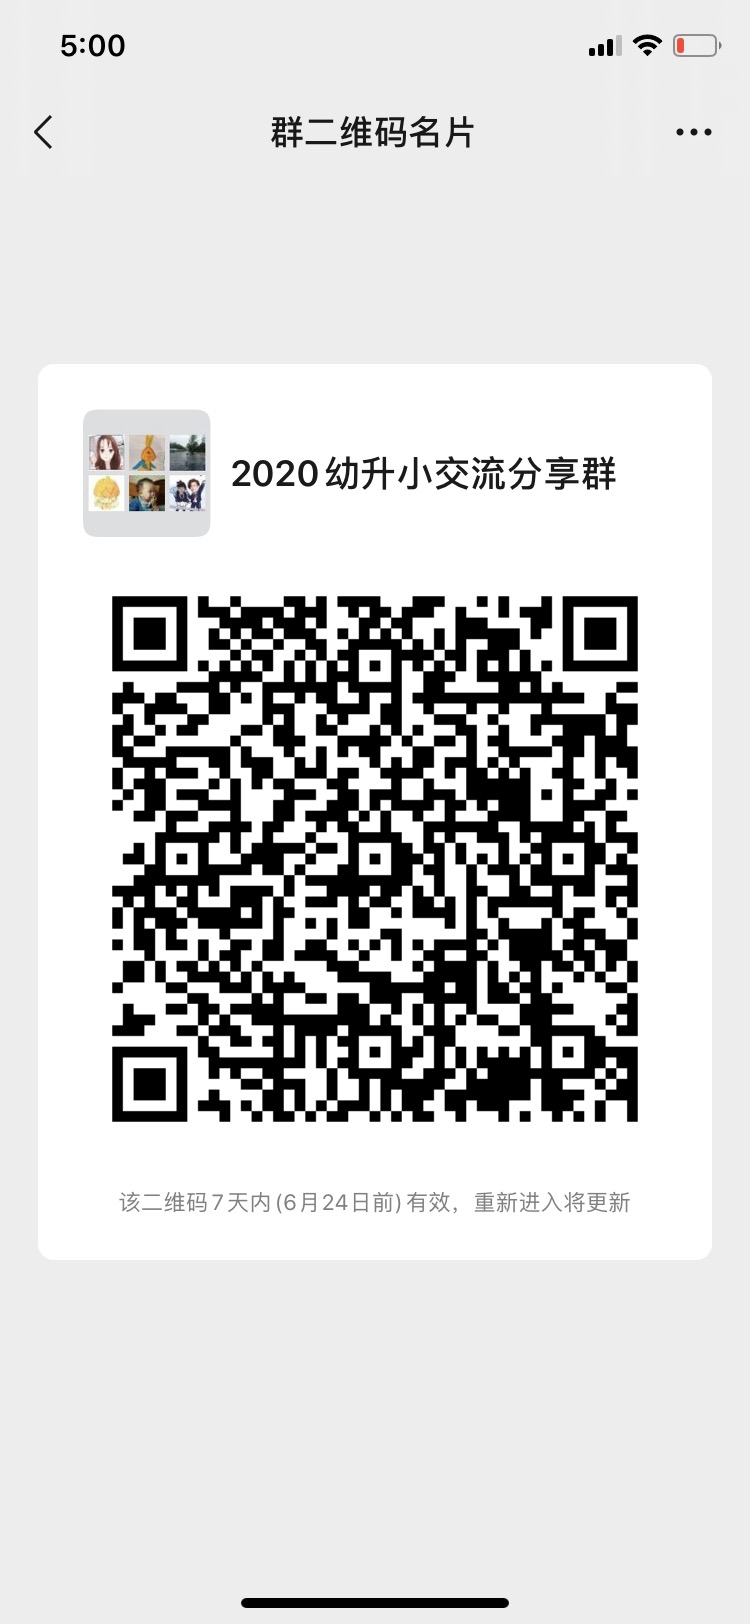 4BF4C482-F0A7-420E-9702-E30E569B85D2.jpg